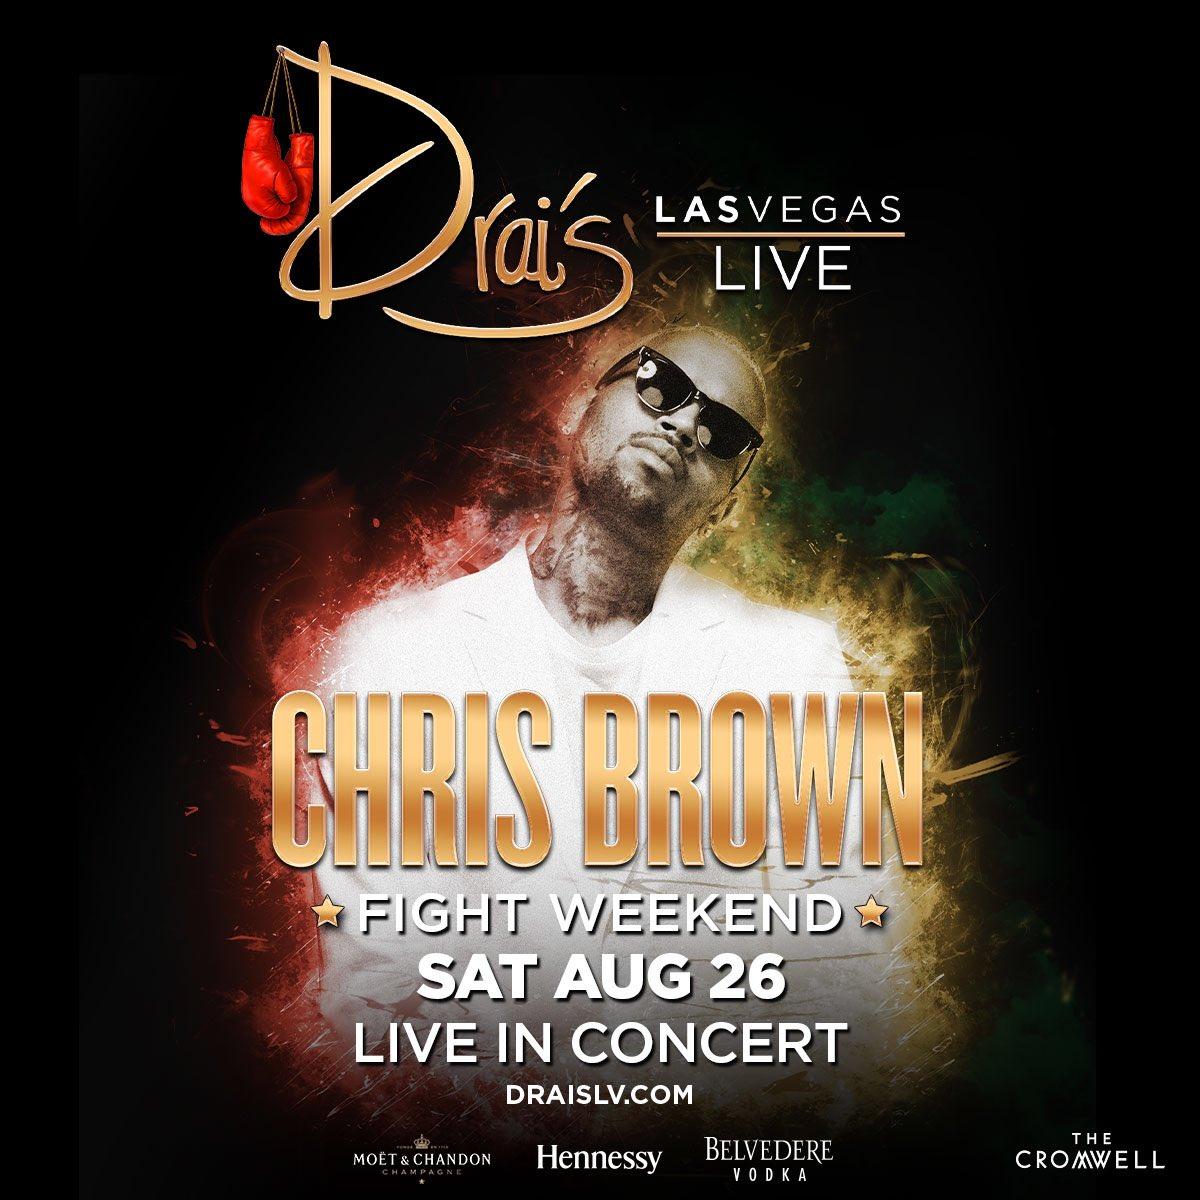 Vegas! I'm back for #FightWeekend at @DraisLV Nightclub on Saturday, August 26! Tickets: https://t.co/xZqcwM1t86 https://t.co/lwsJwmqqjJ